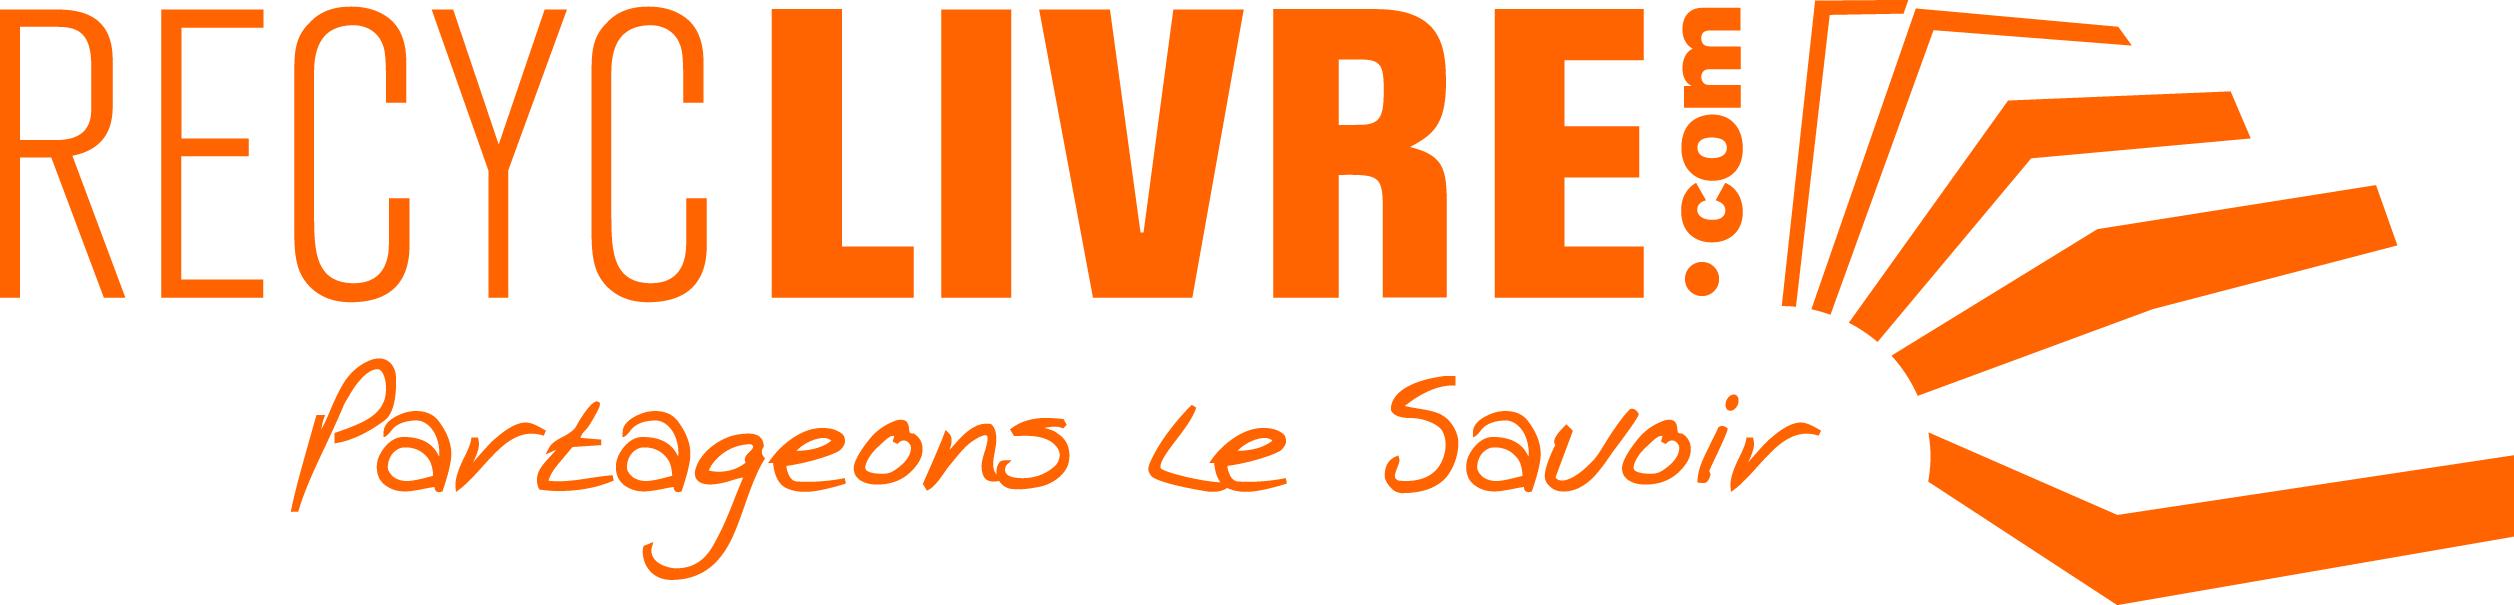 Logo marketplace recyclivre